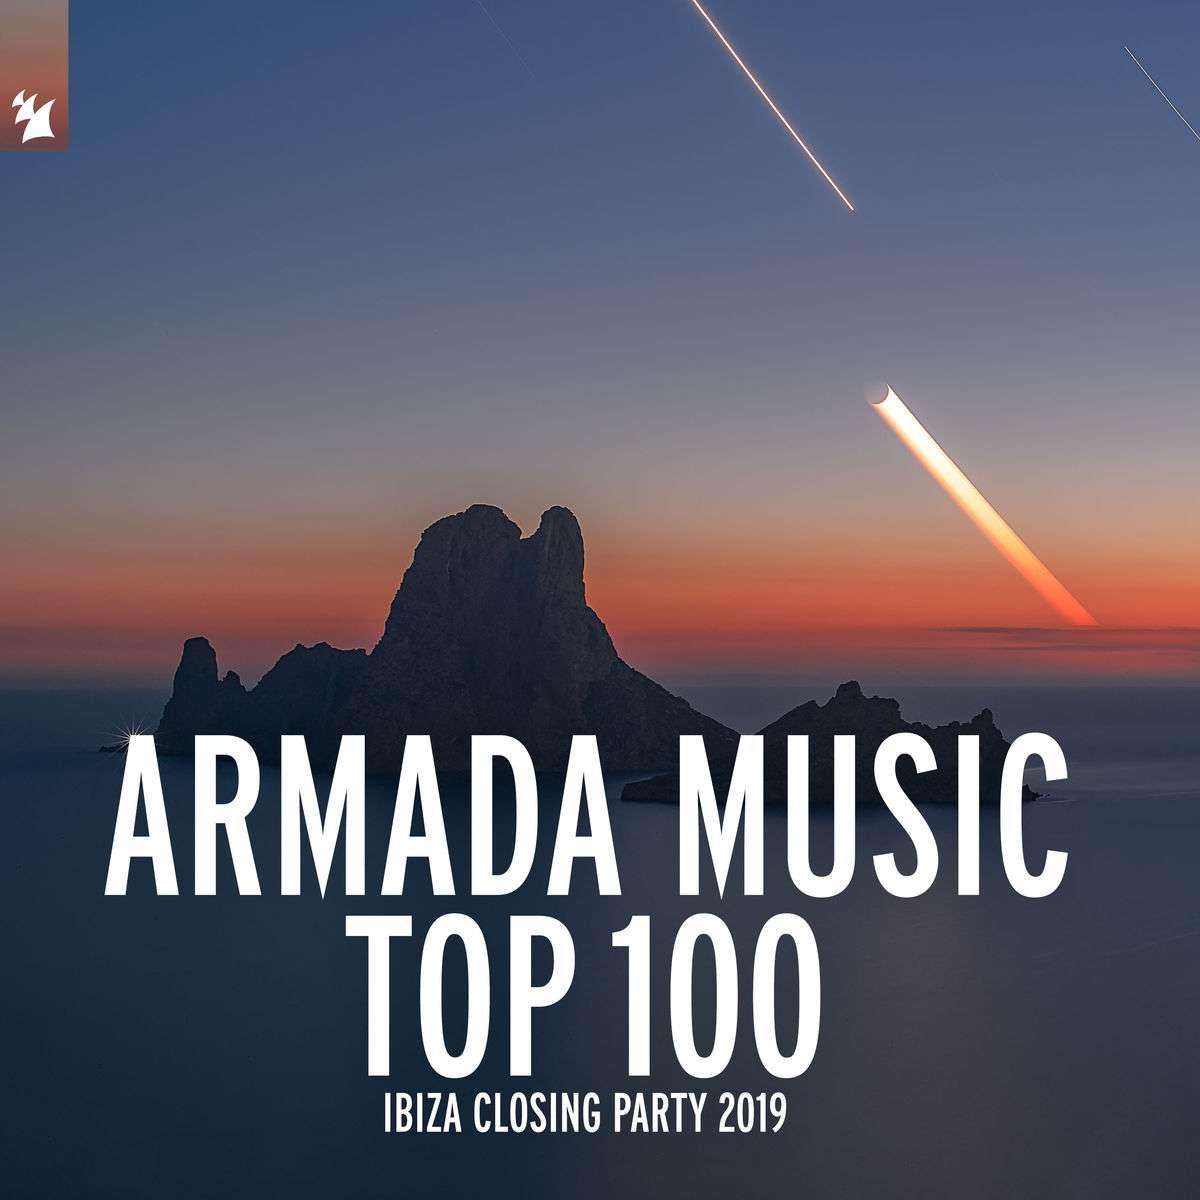 Armada《Armada Music Top 100 – Ibiza Closing Party 2019》[CD级无损/44.1kHz/16bit]